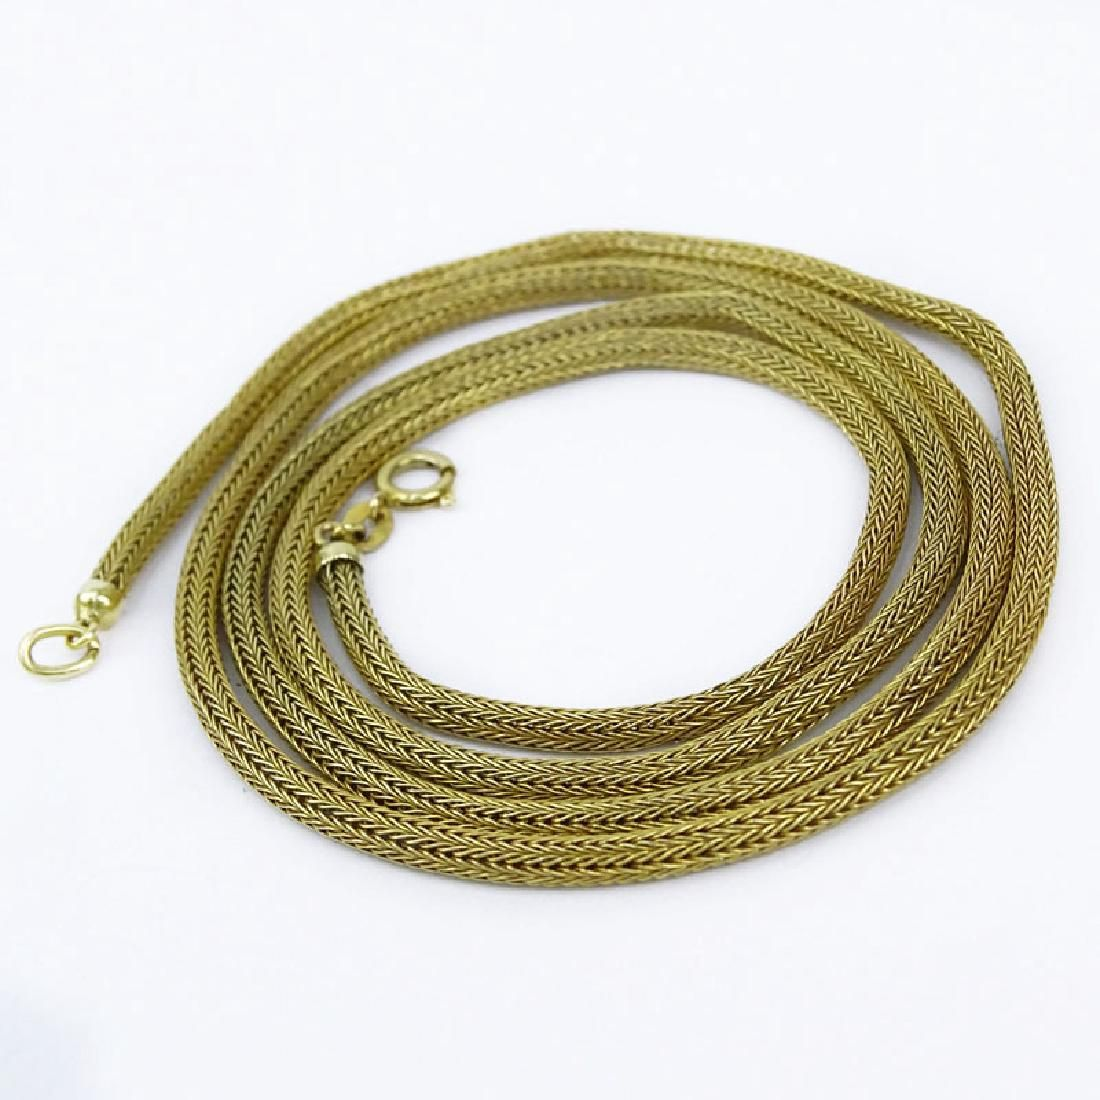 Vintage 18 Karat Yellow Gold Mesh Link Necklace.